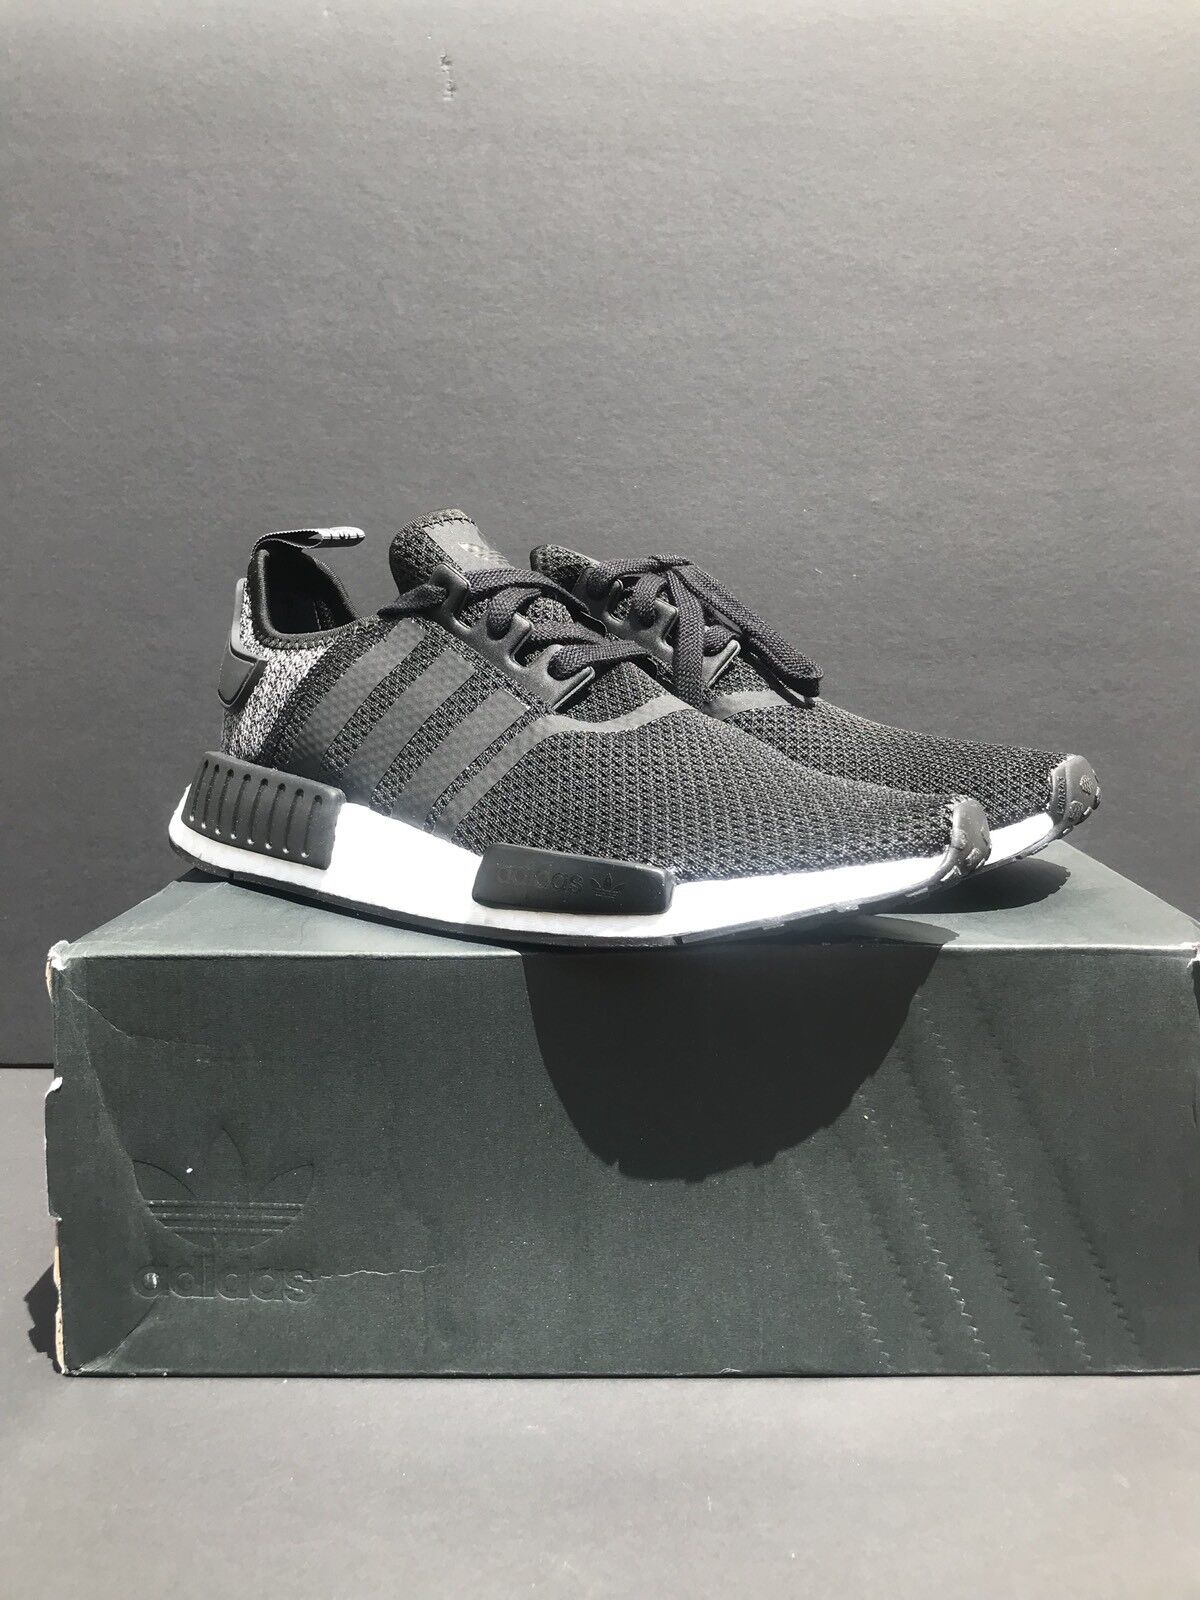 New New New Adidas NMD R1 Black Grey Wool Mesh Black shoes Size 9.5. DB0544 536974